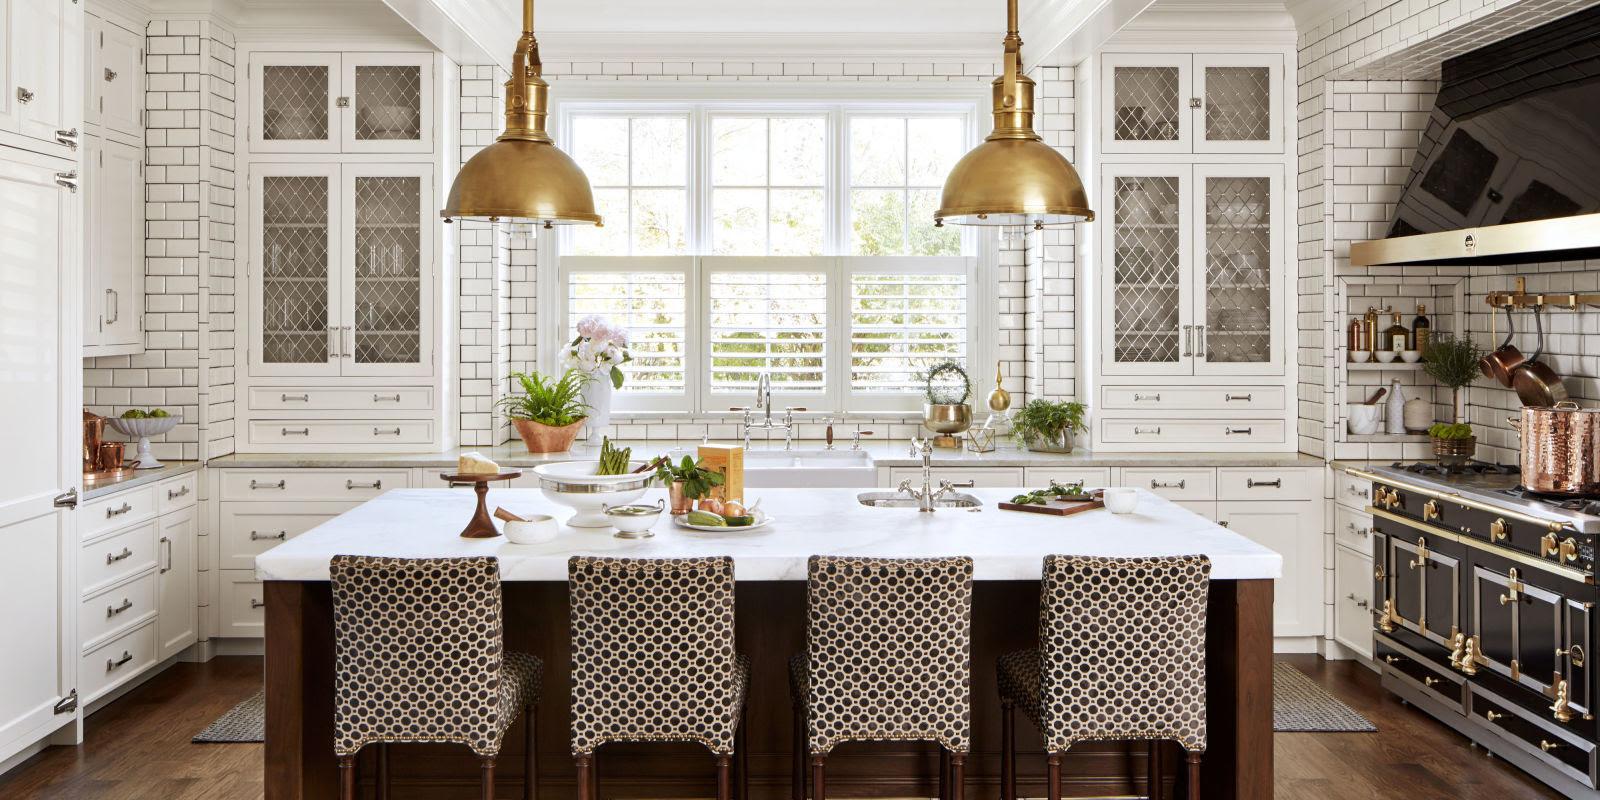 Kitchen Cabinets Ideas For Small Kitchen   Kitchen Decor ...